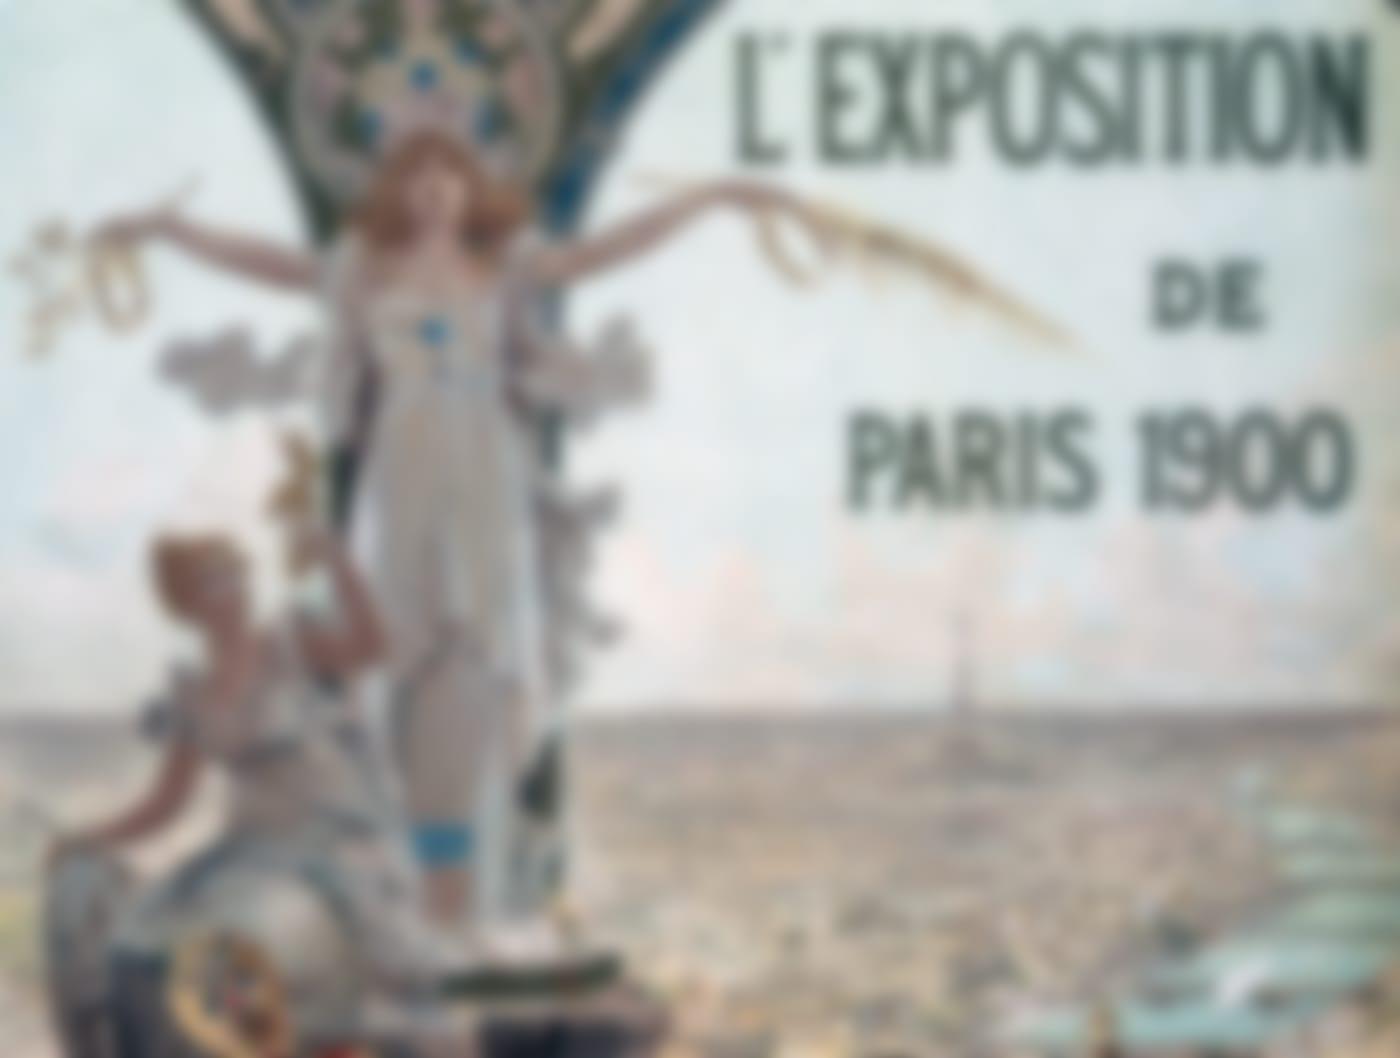 Paris_1900_Visual_look